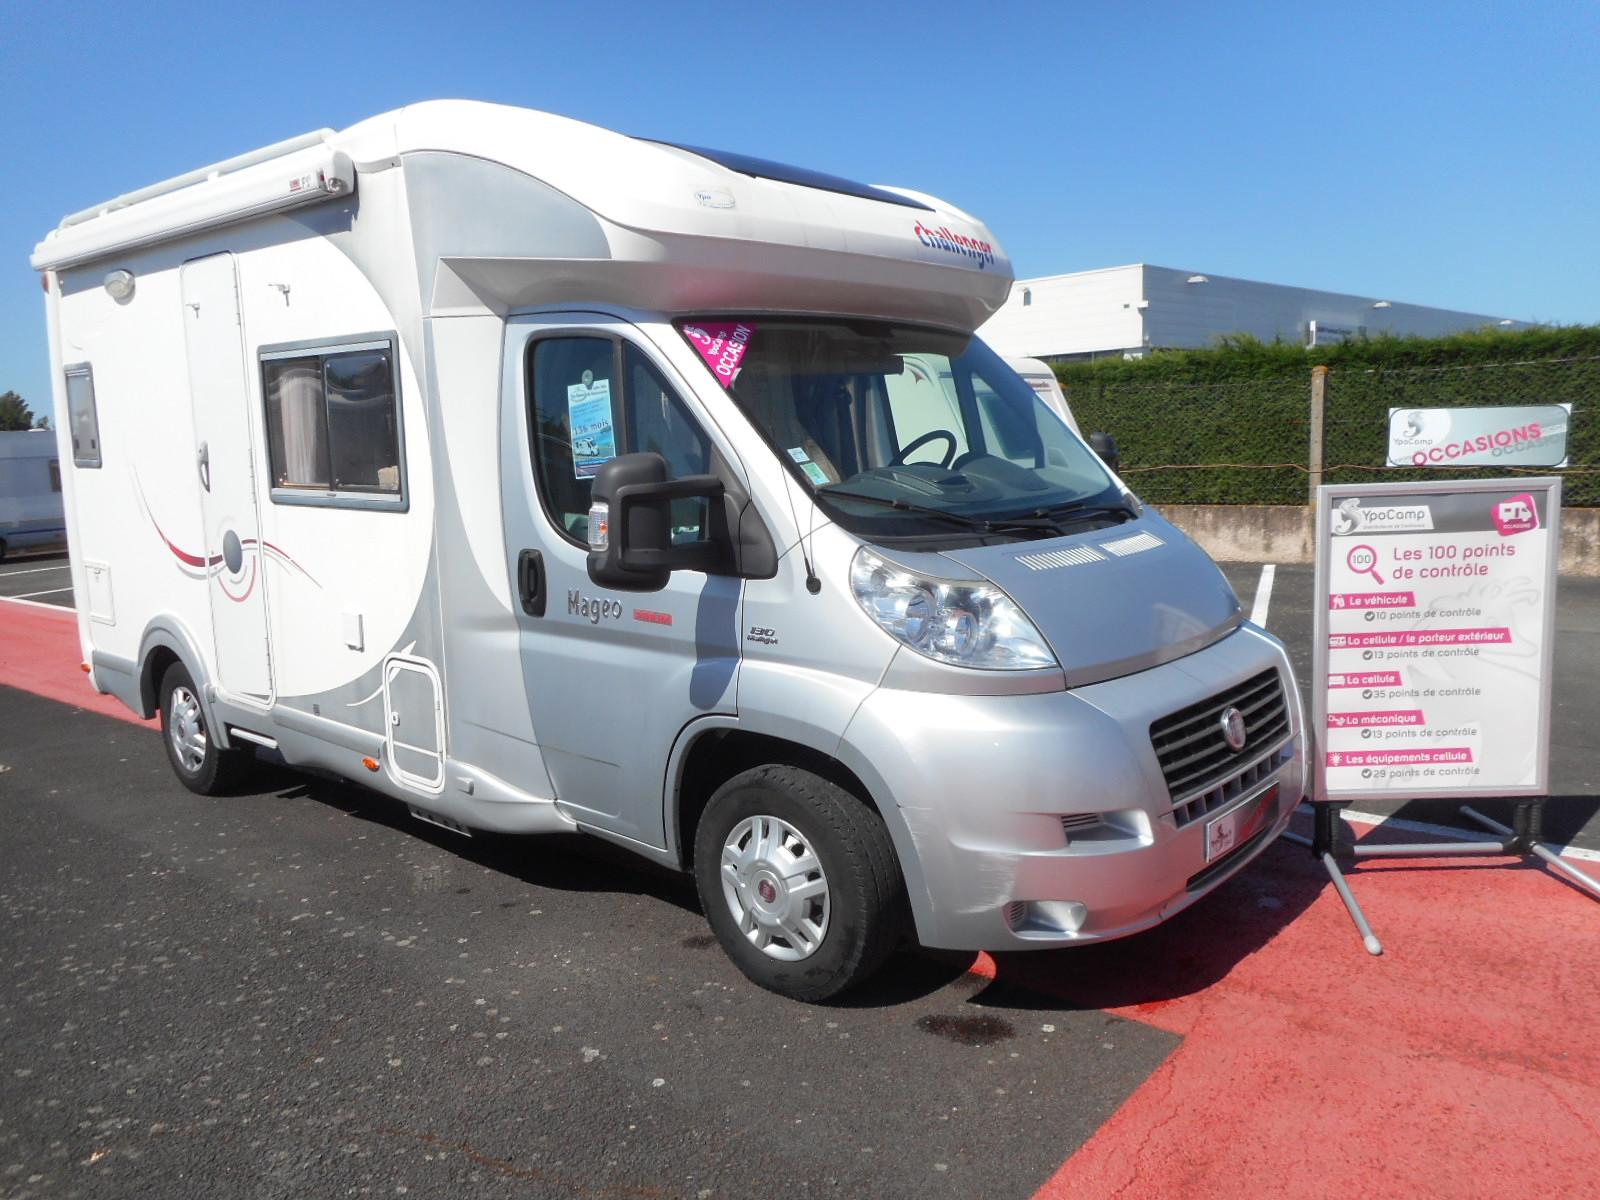 challenger mageo prium occasion de 2010 fiat camping car en vente rochefort charente. Black Bedroom Furniture Sets. Home Design Ideas